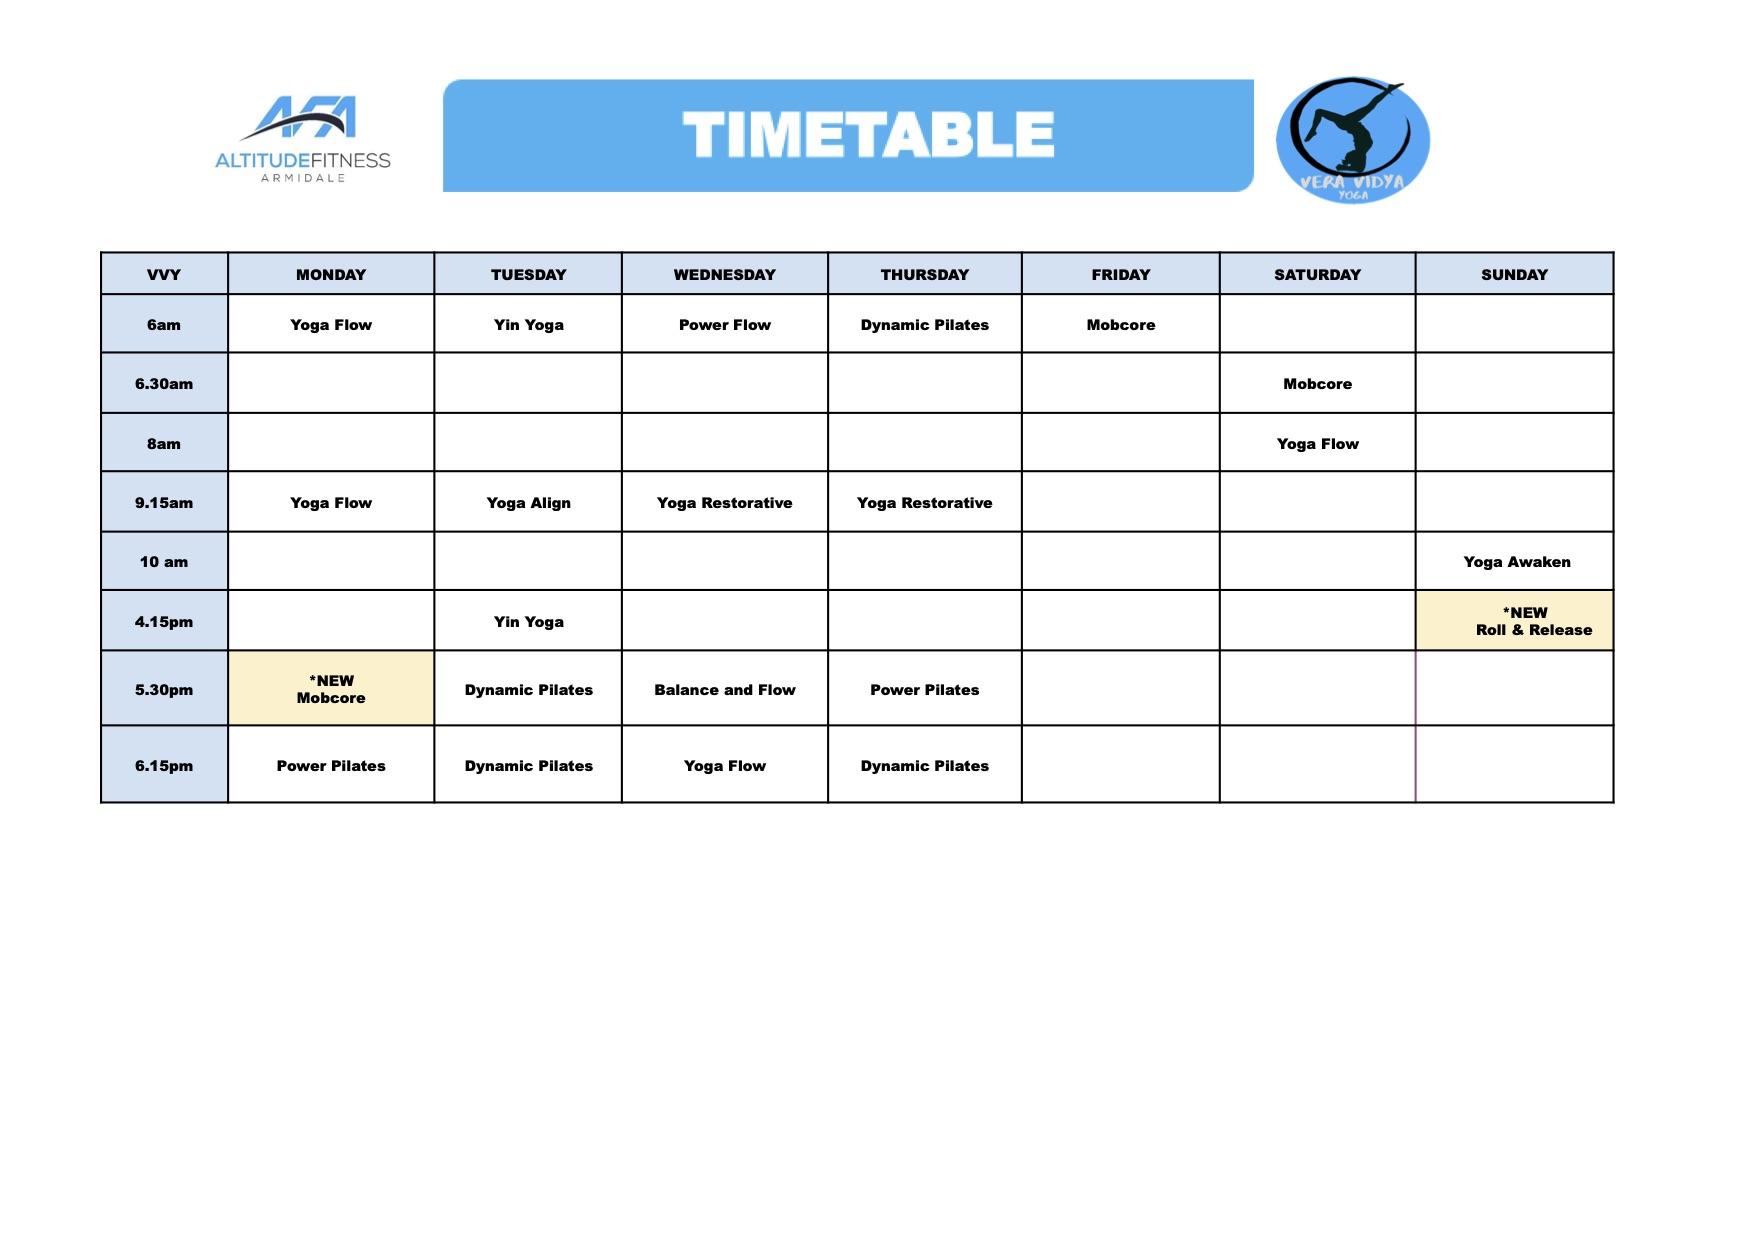 Coroncise timetable